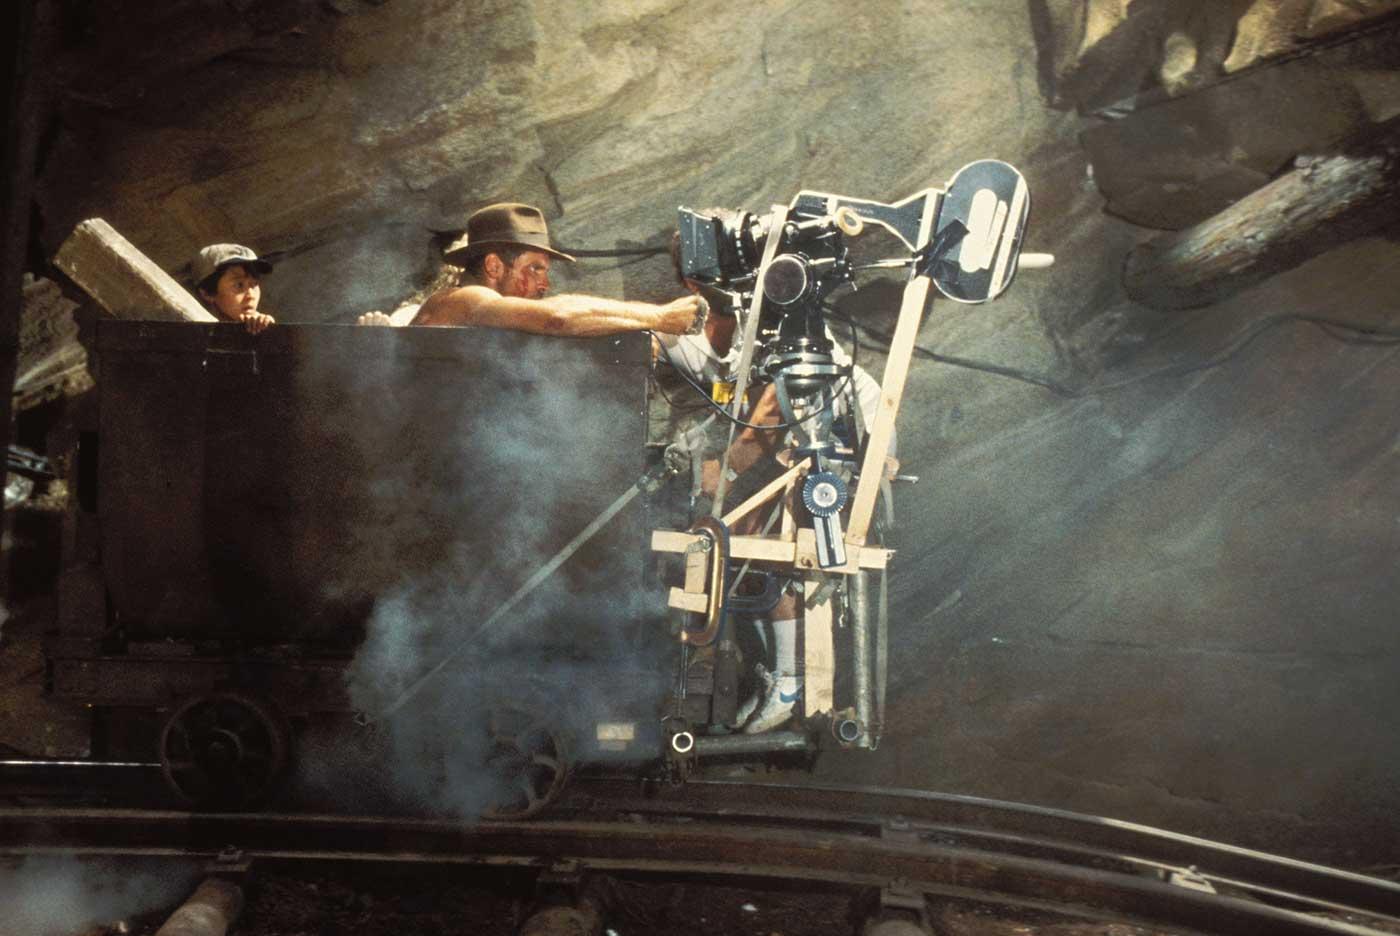 Харрисон Форд на съемках картины «Индиана Джонс и храм судьбы».